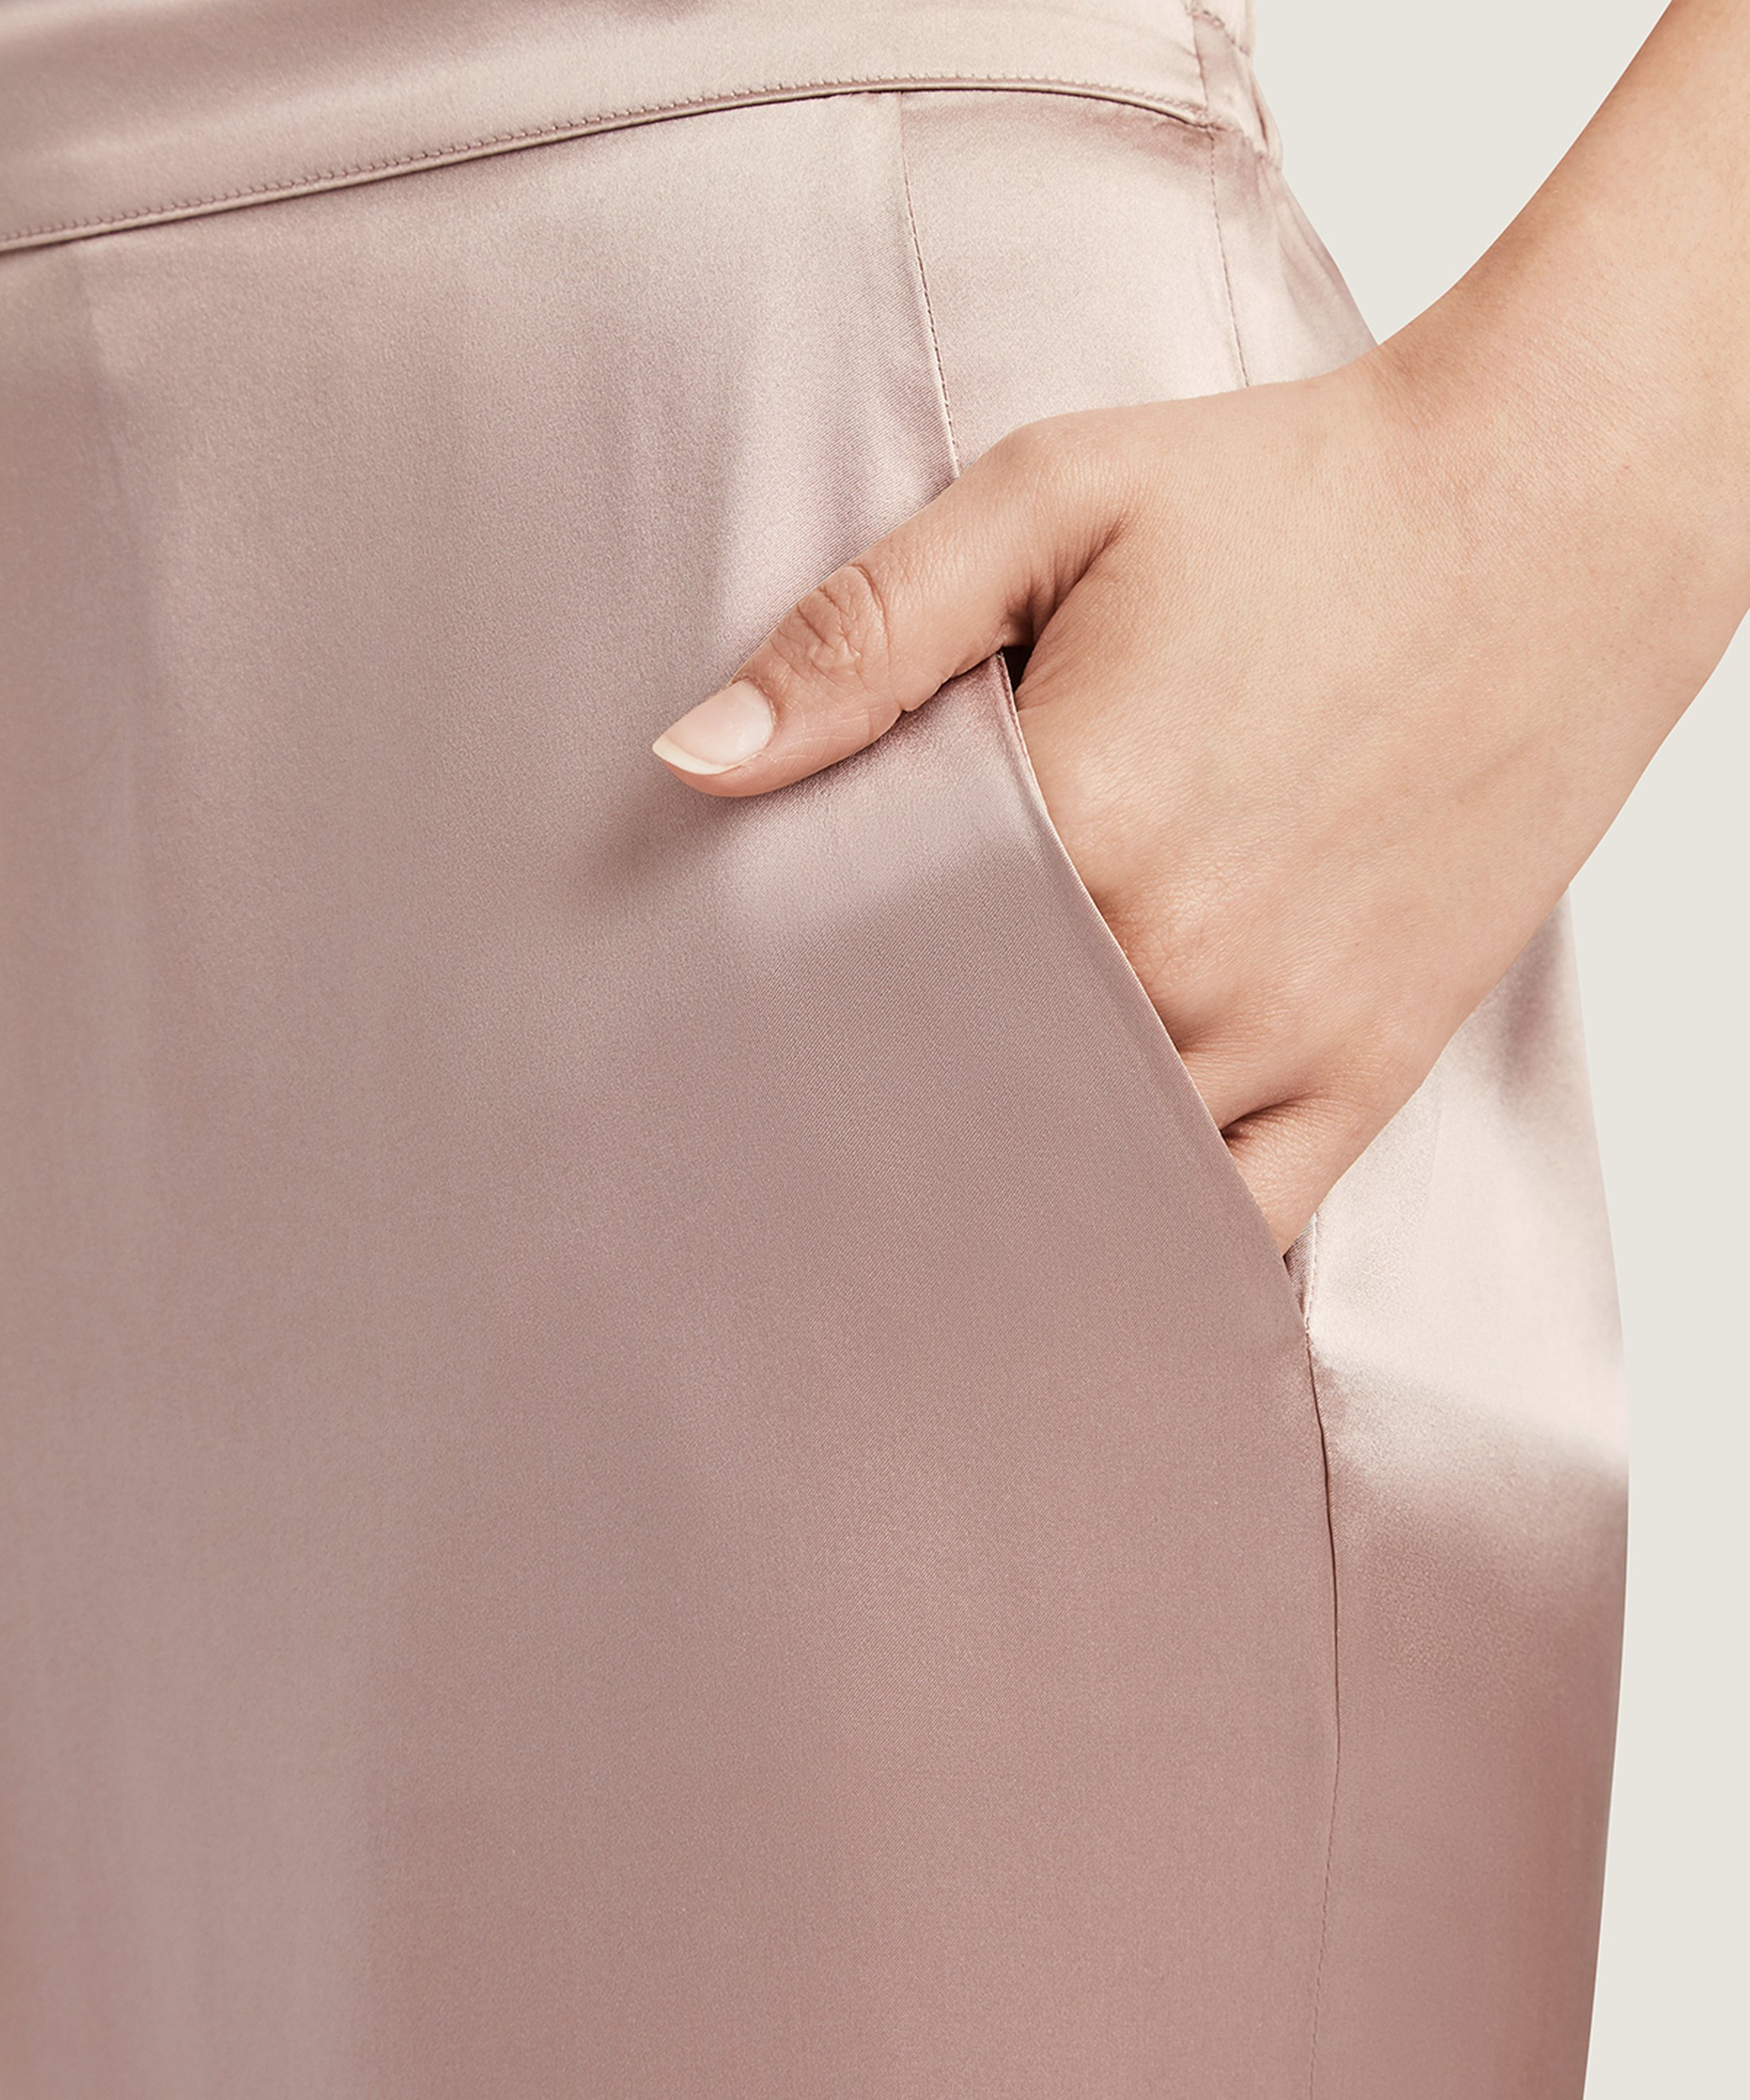 TOI MON AMOUR Pantalon en soie Rose Sonate | Aubade